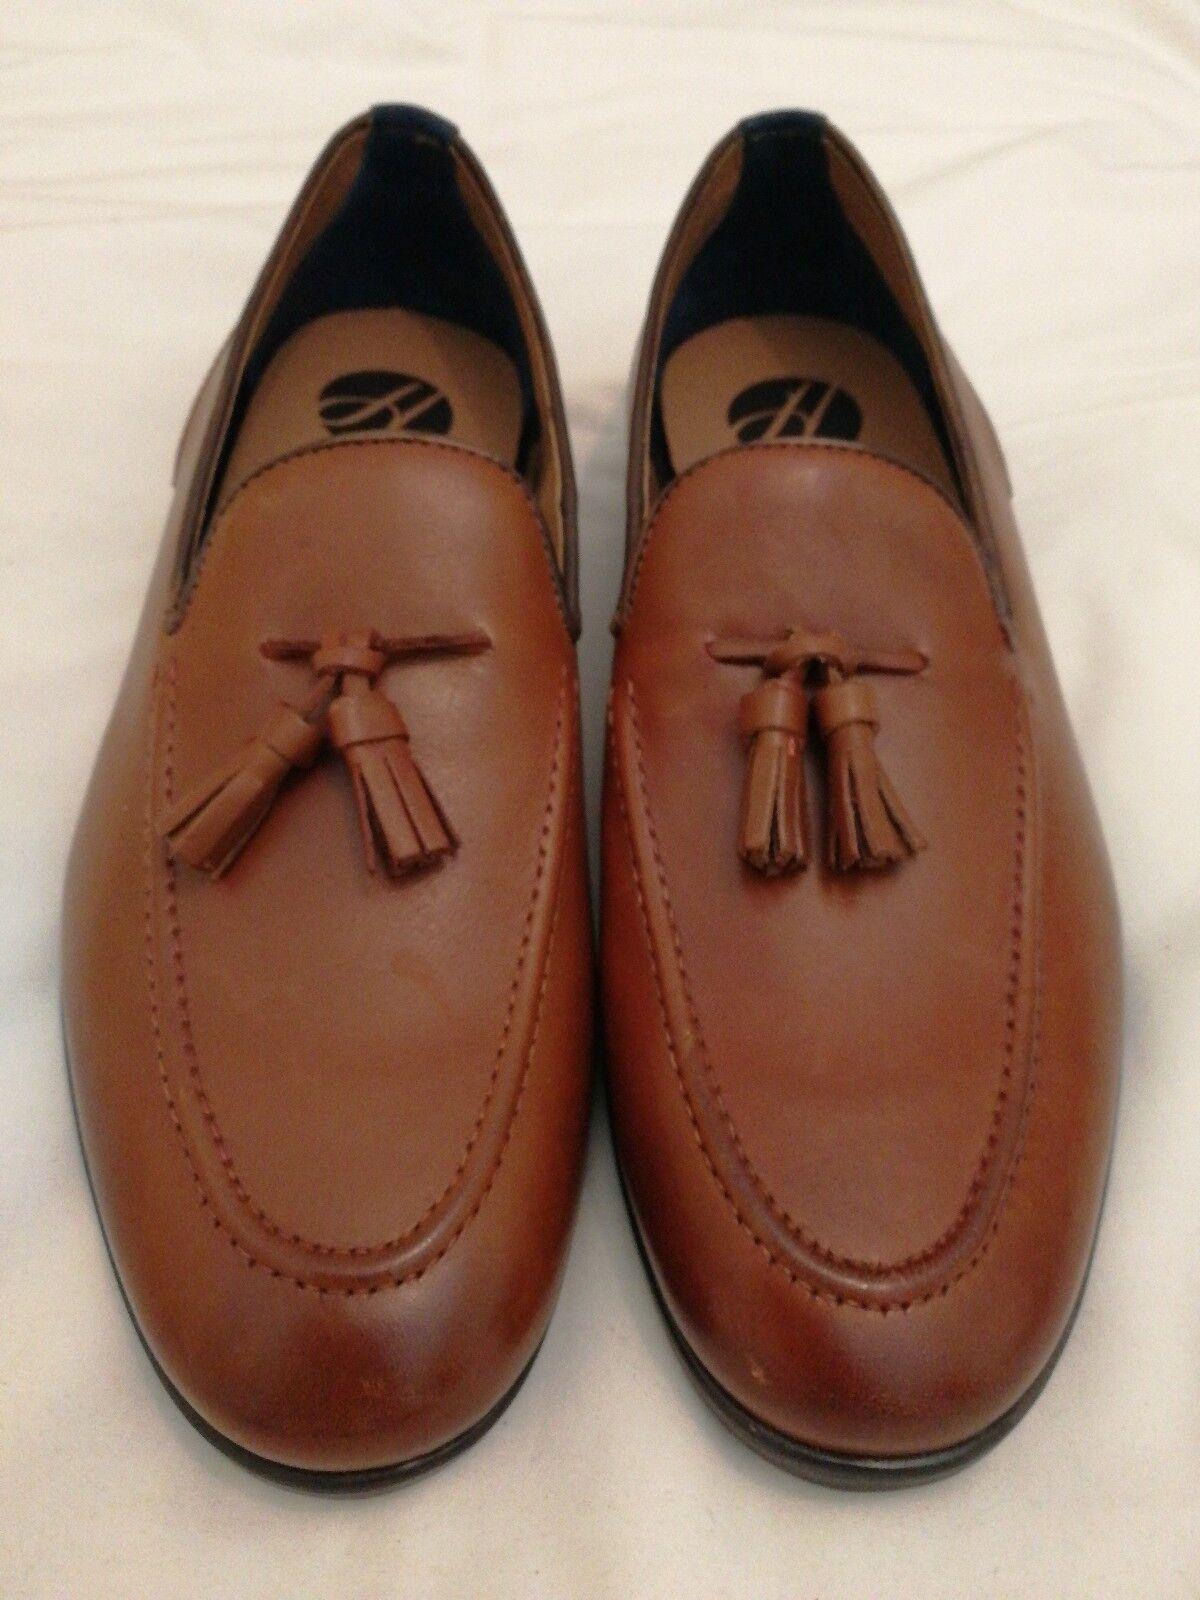 H By Hudson Aylsham Ser01 Leather Slip-on Tassel Loafers shoes Tan eu 43